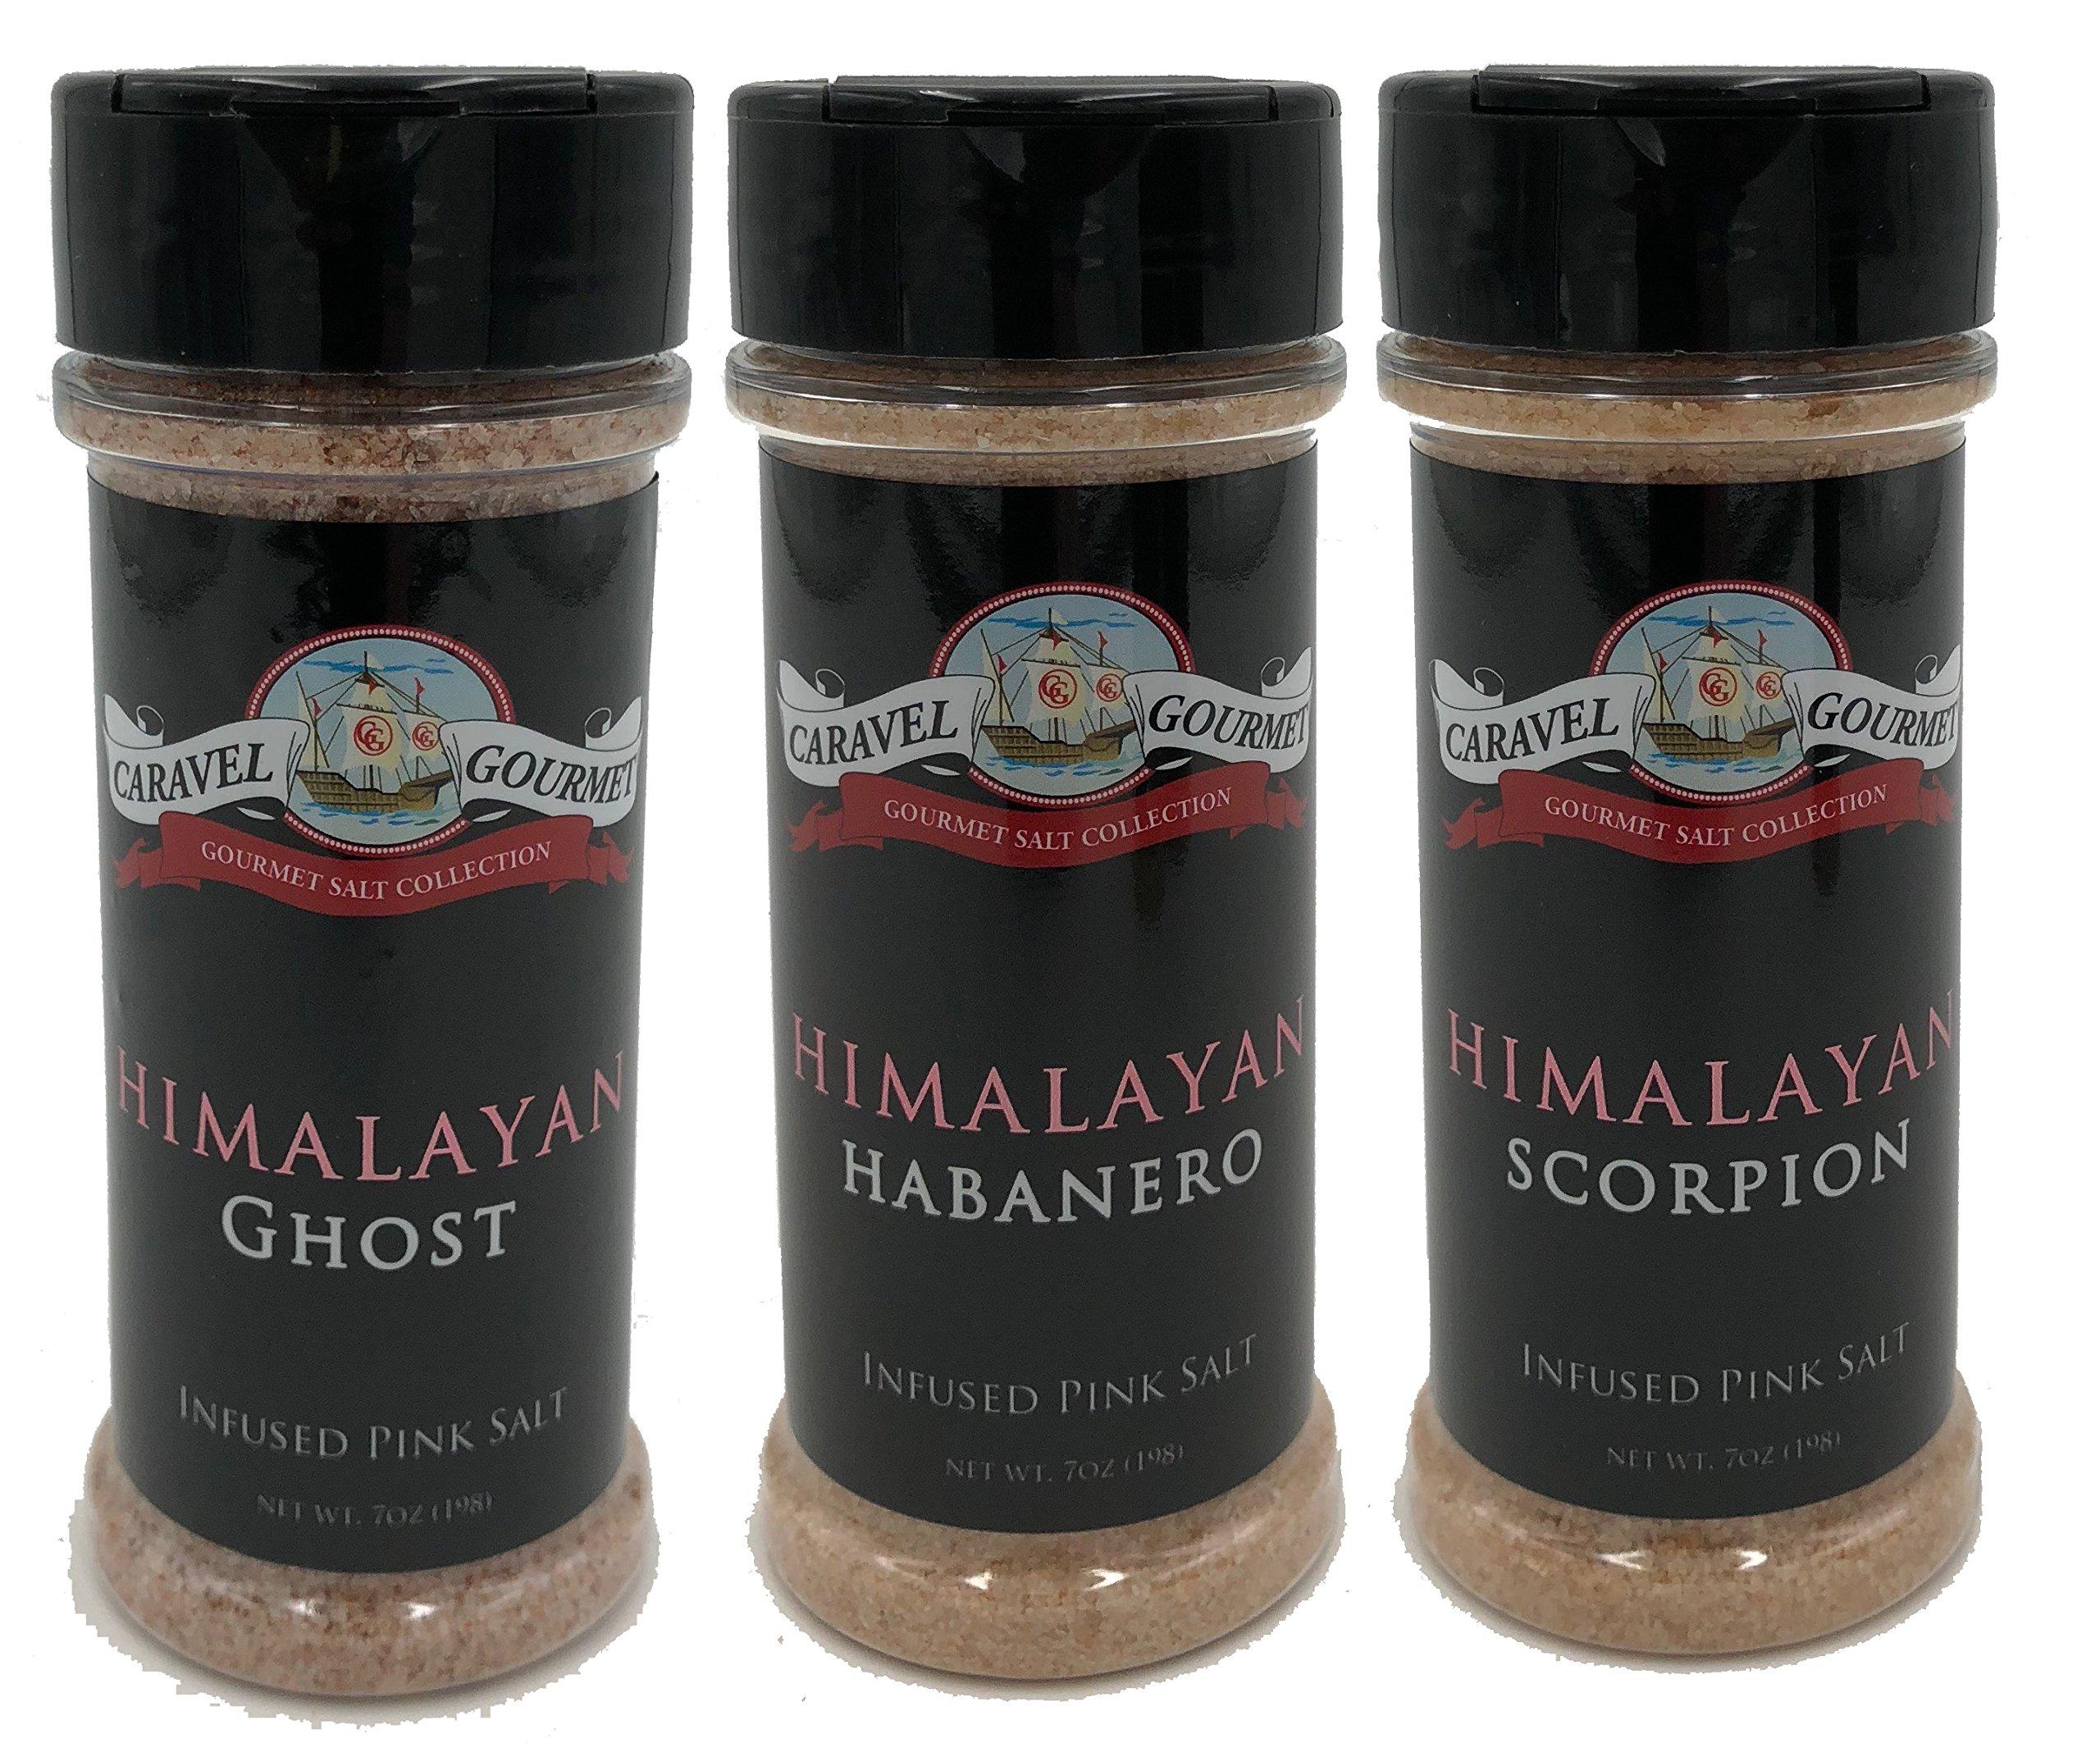 Himalayan Ghost, Habanero & Scorpion Pepper - 3 Pack